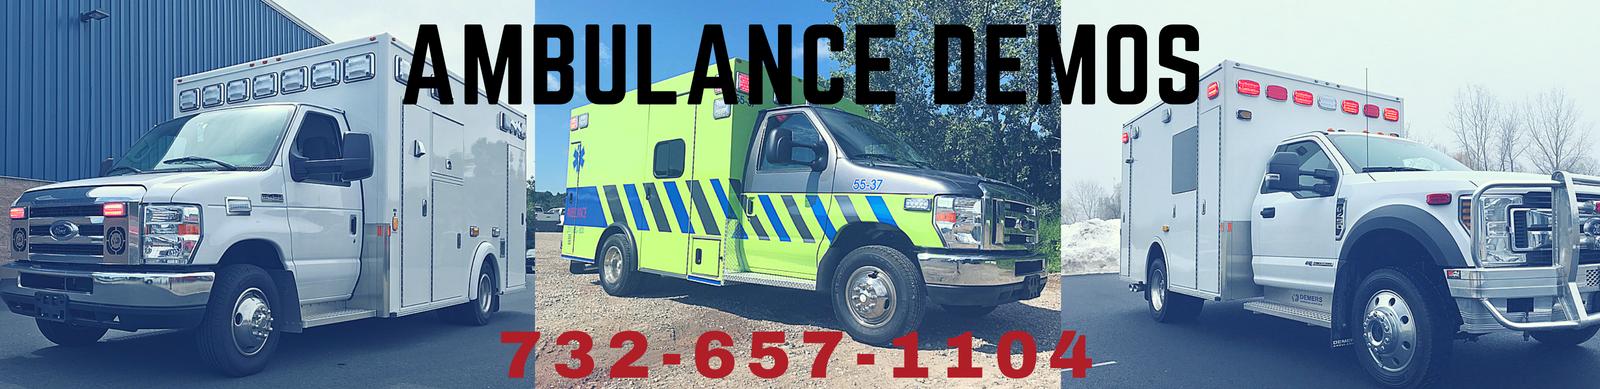 Ambulances Available